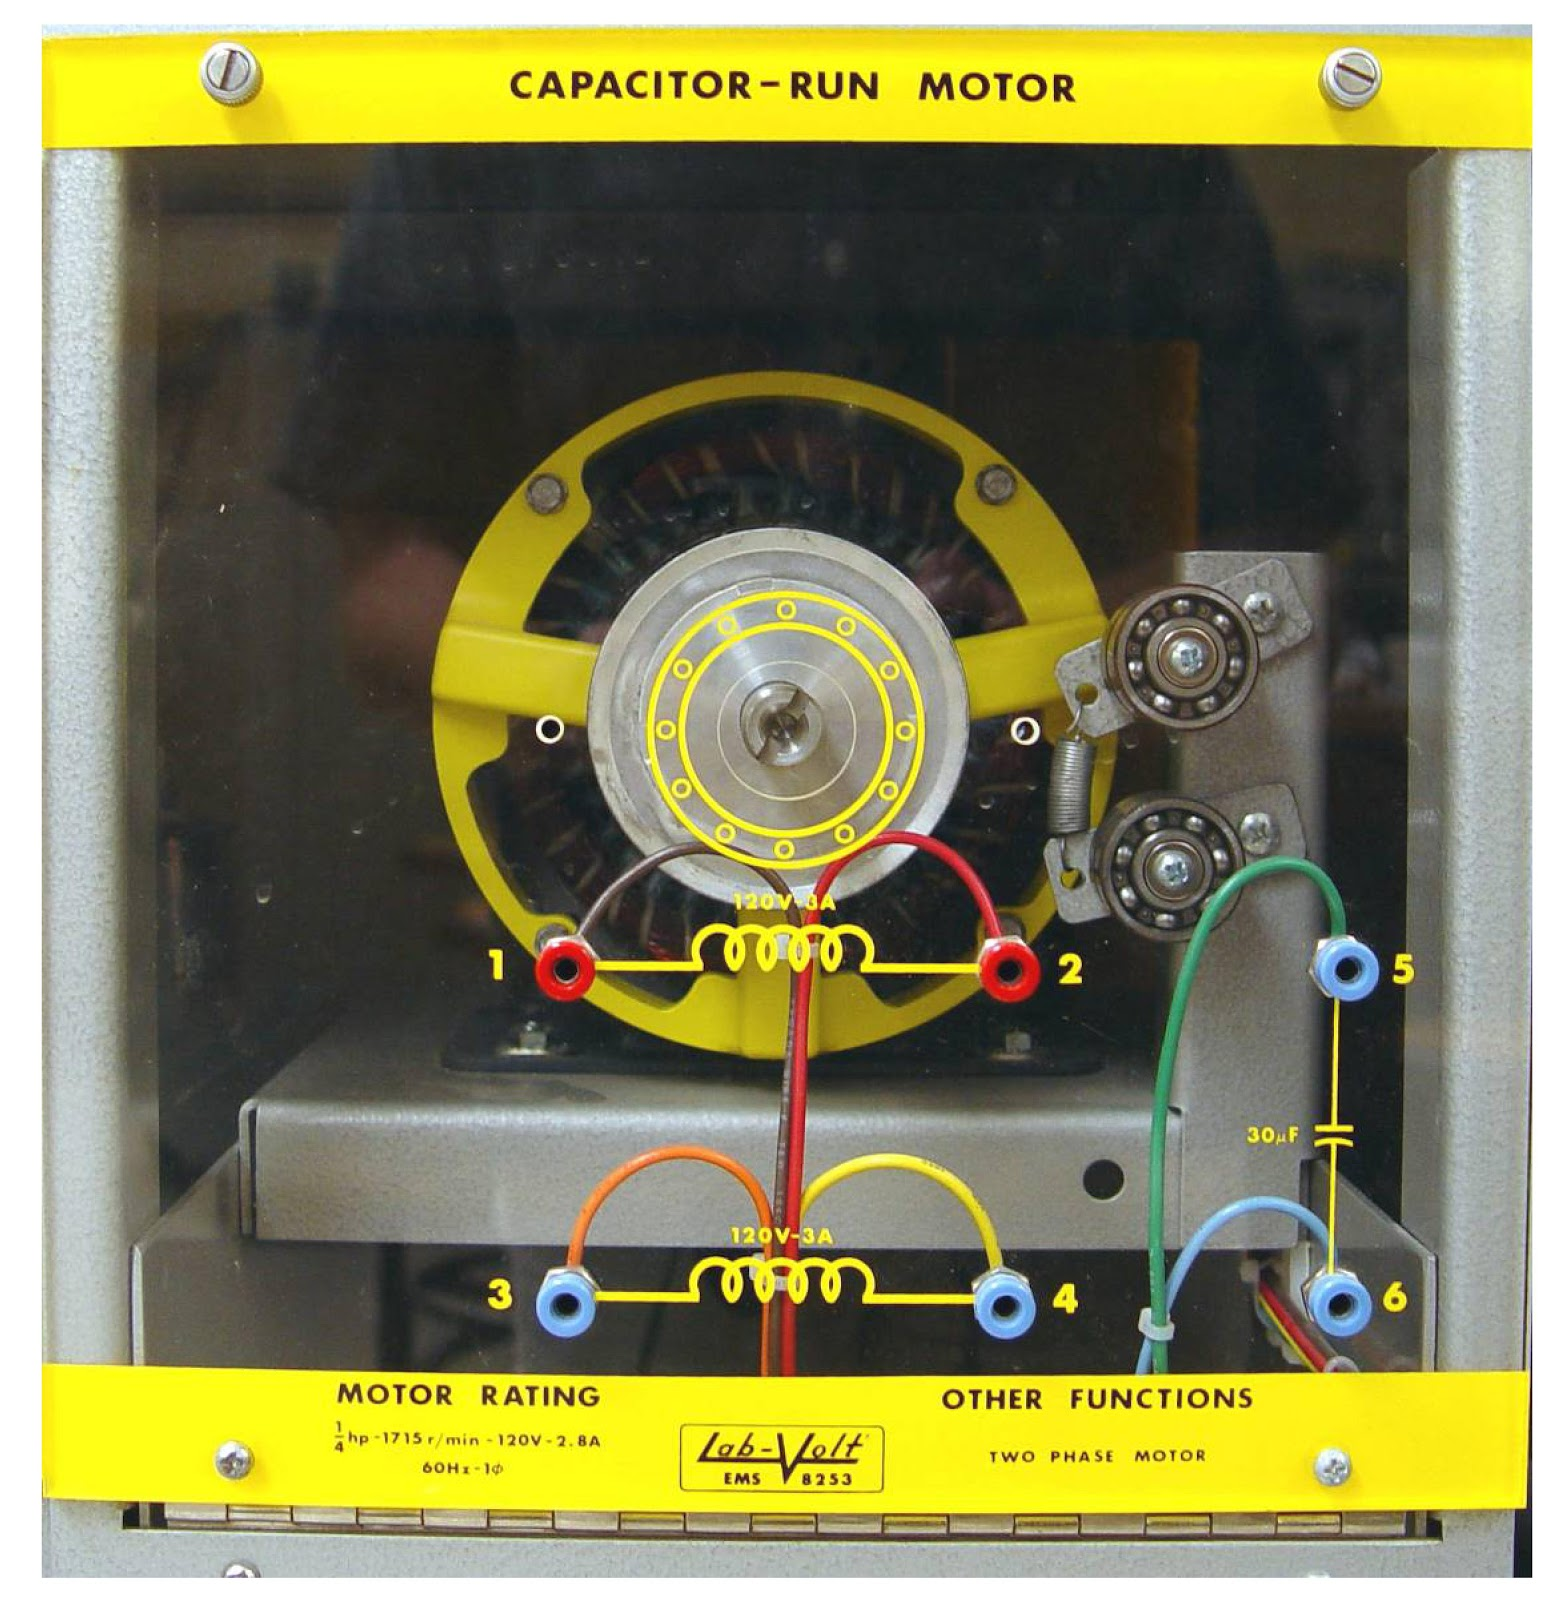 Capacitor Start Capacitor Run Induction Motor